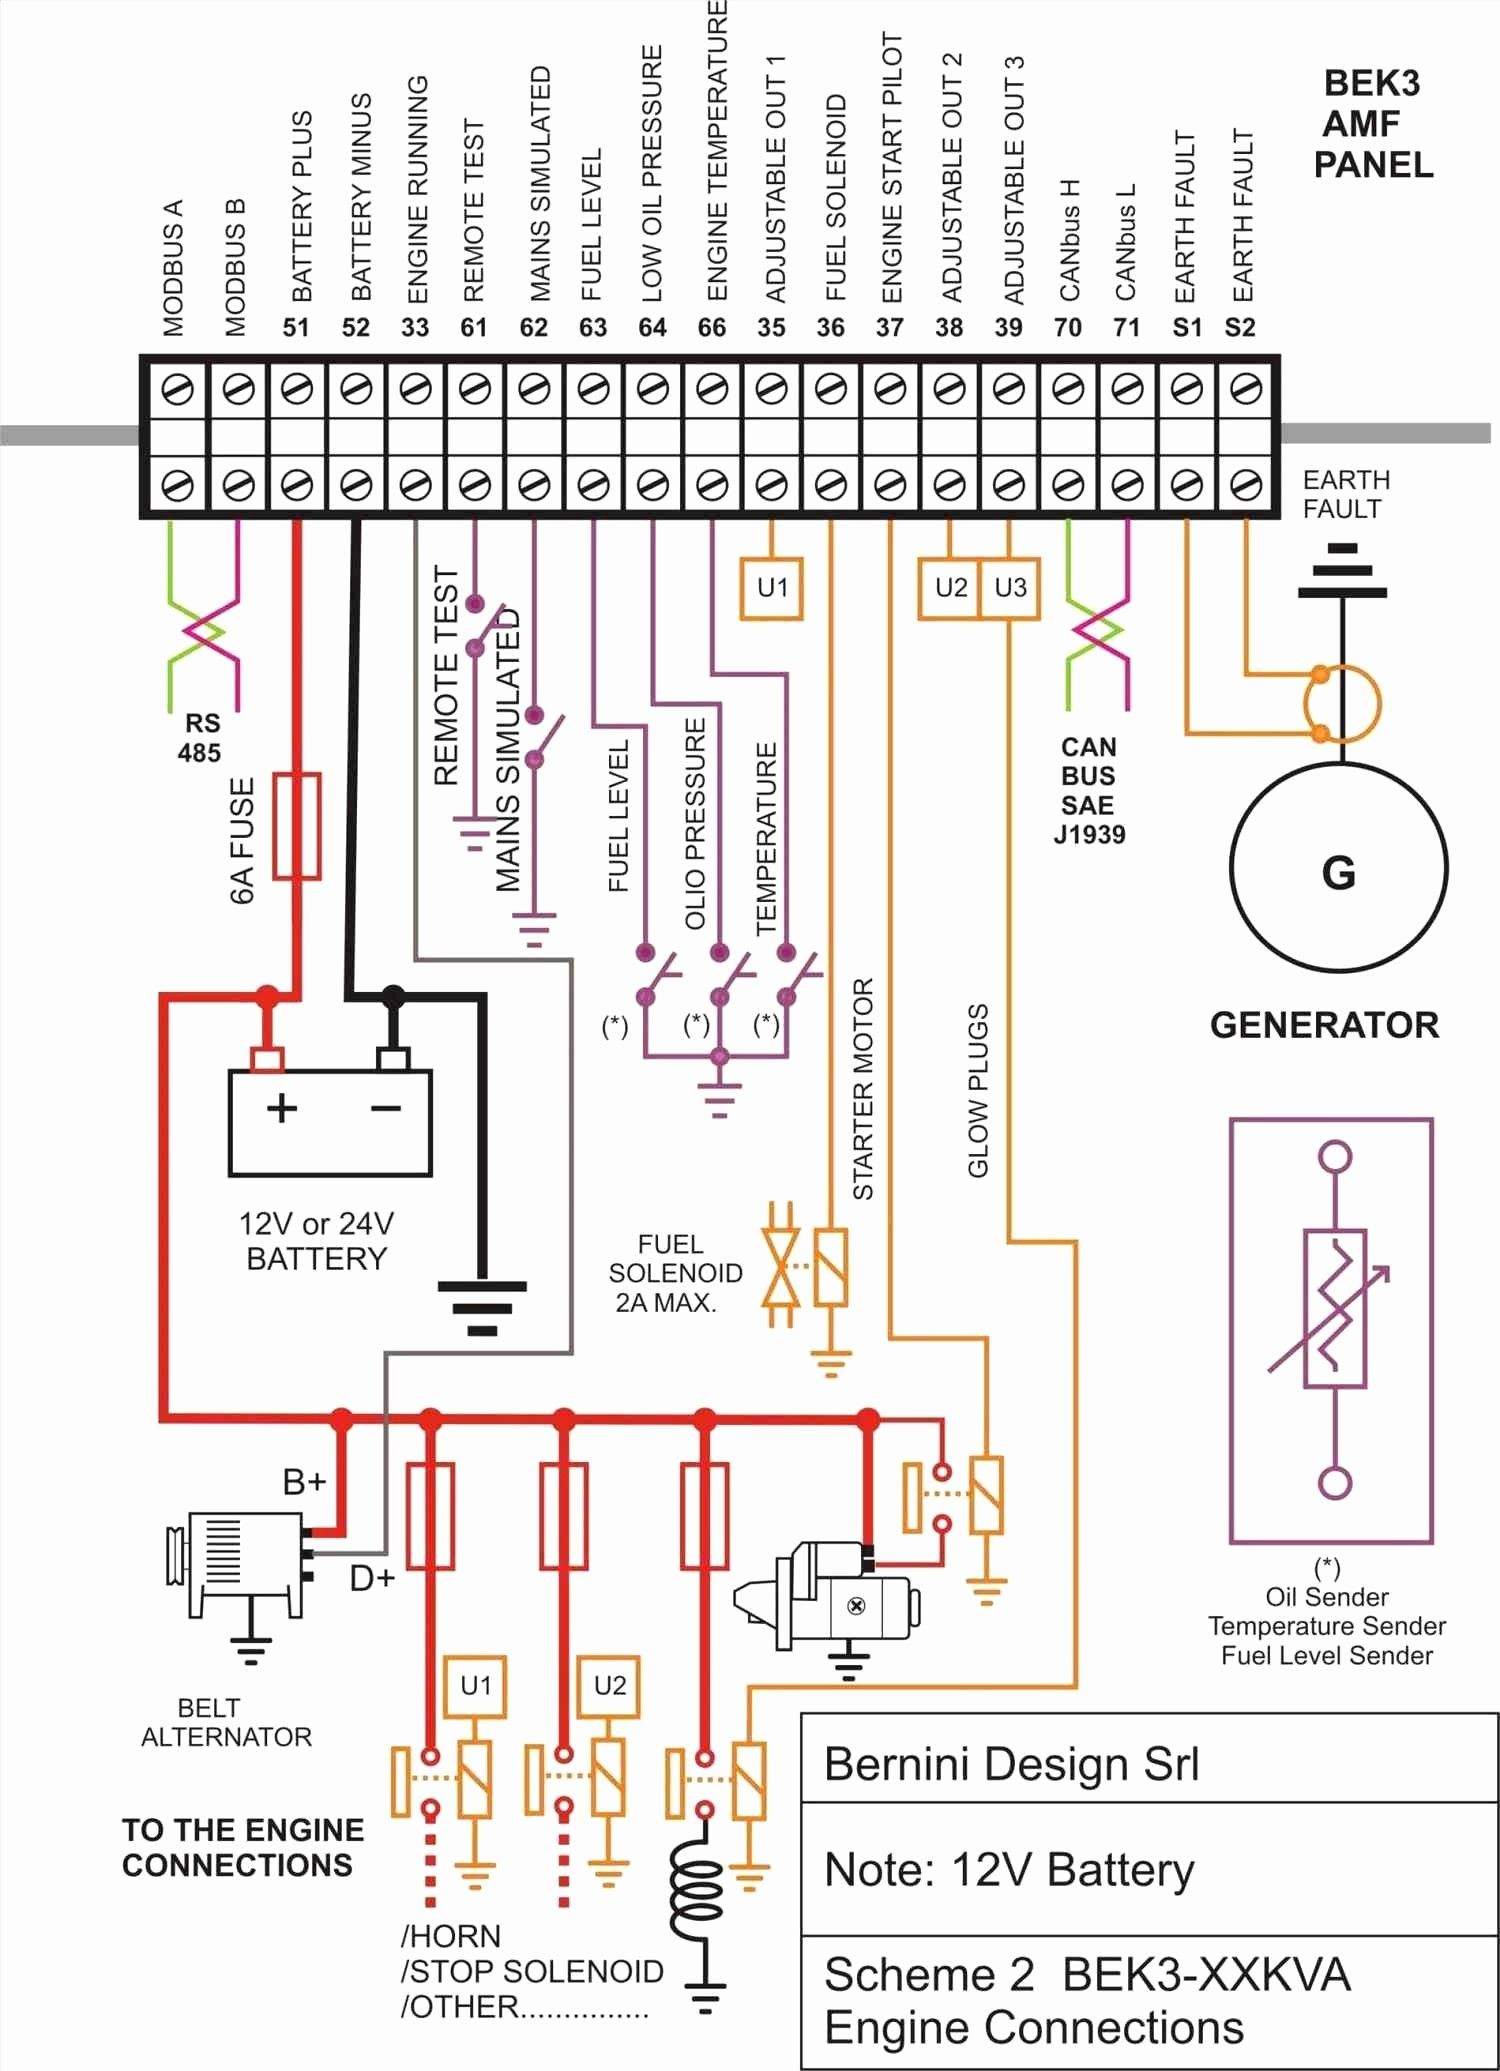 Hvac Wiring Diagram Test - Fusebox and Wiring Diagram layout-guess -  layout-guess.modelrc.it | Hvac Wiring Diagram Test |  | modelrc.it